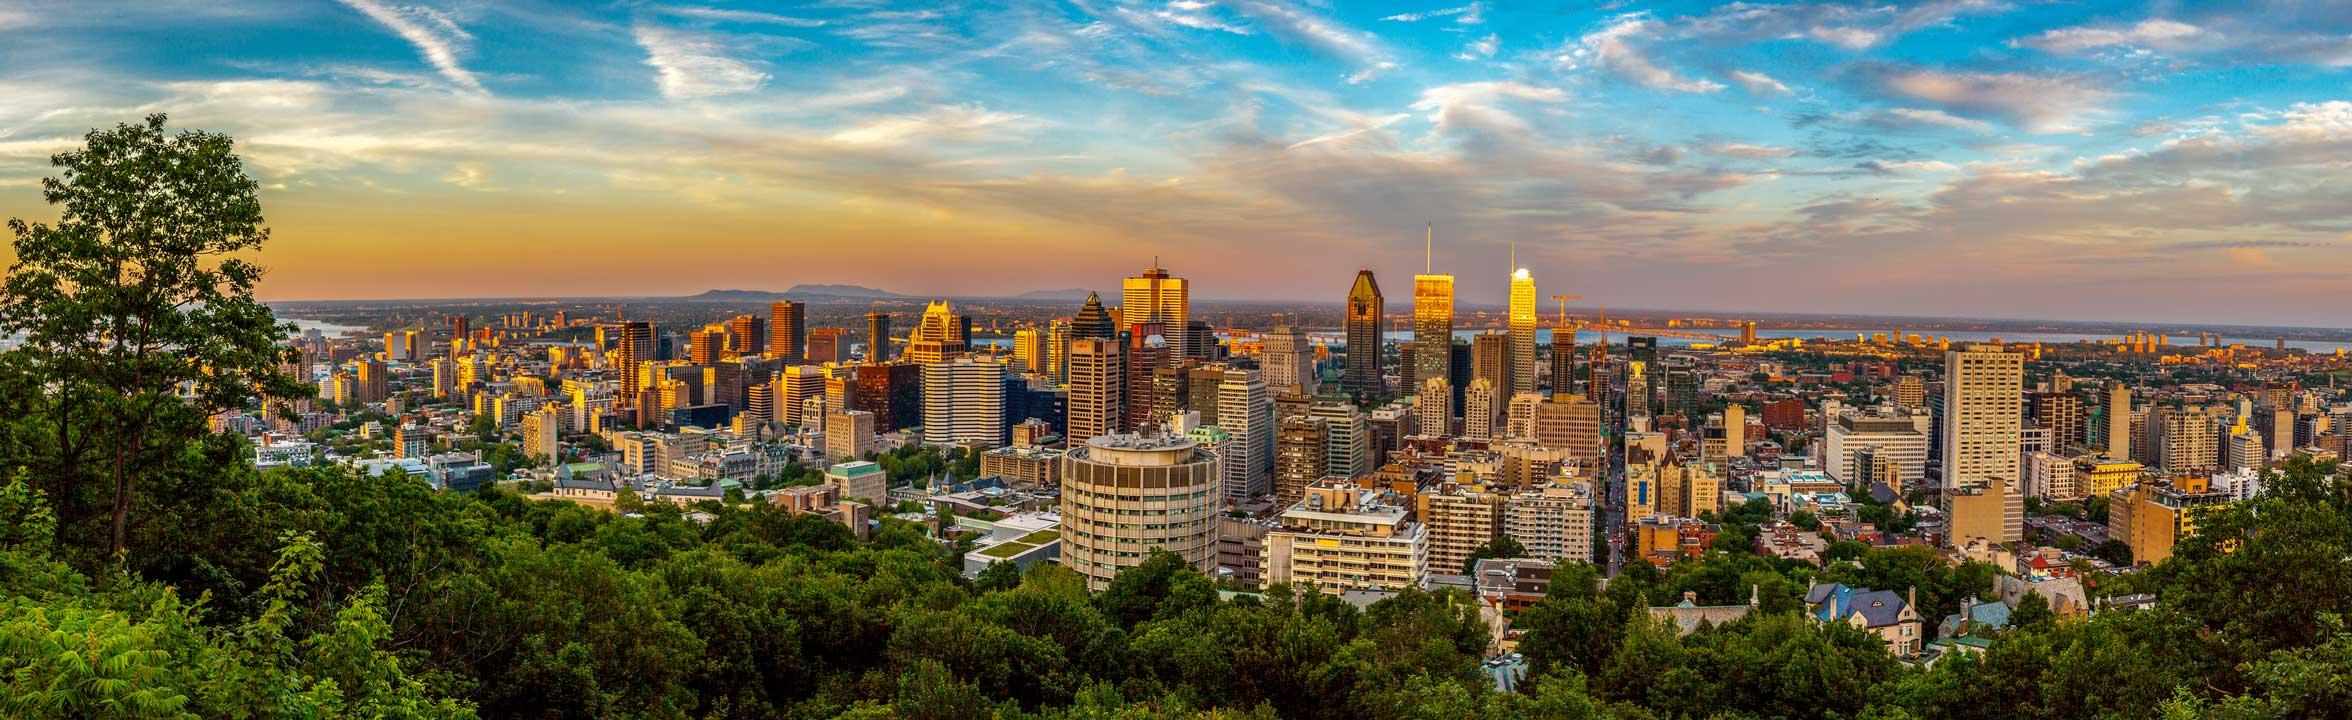 Montreal (image)